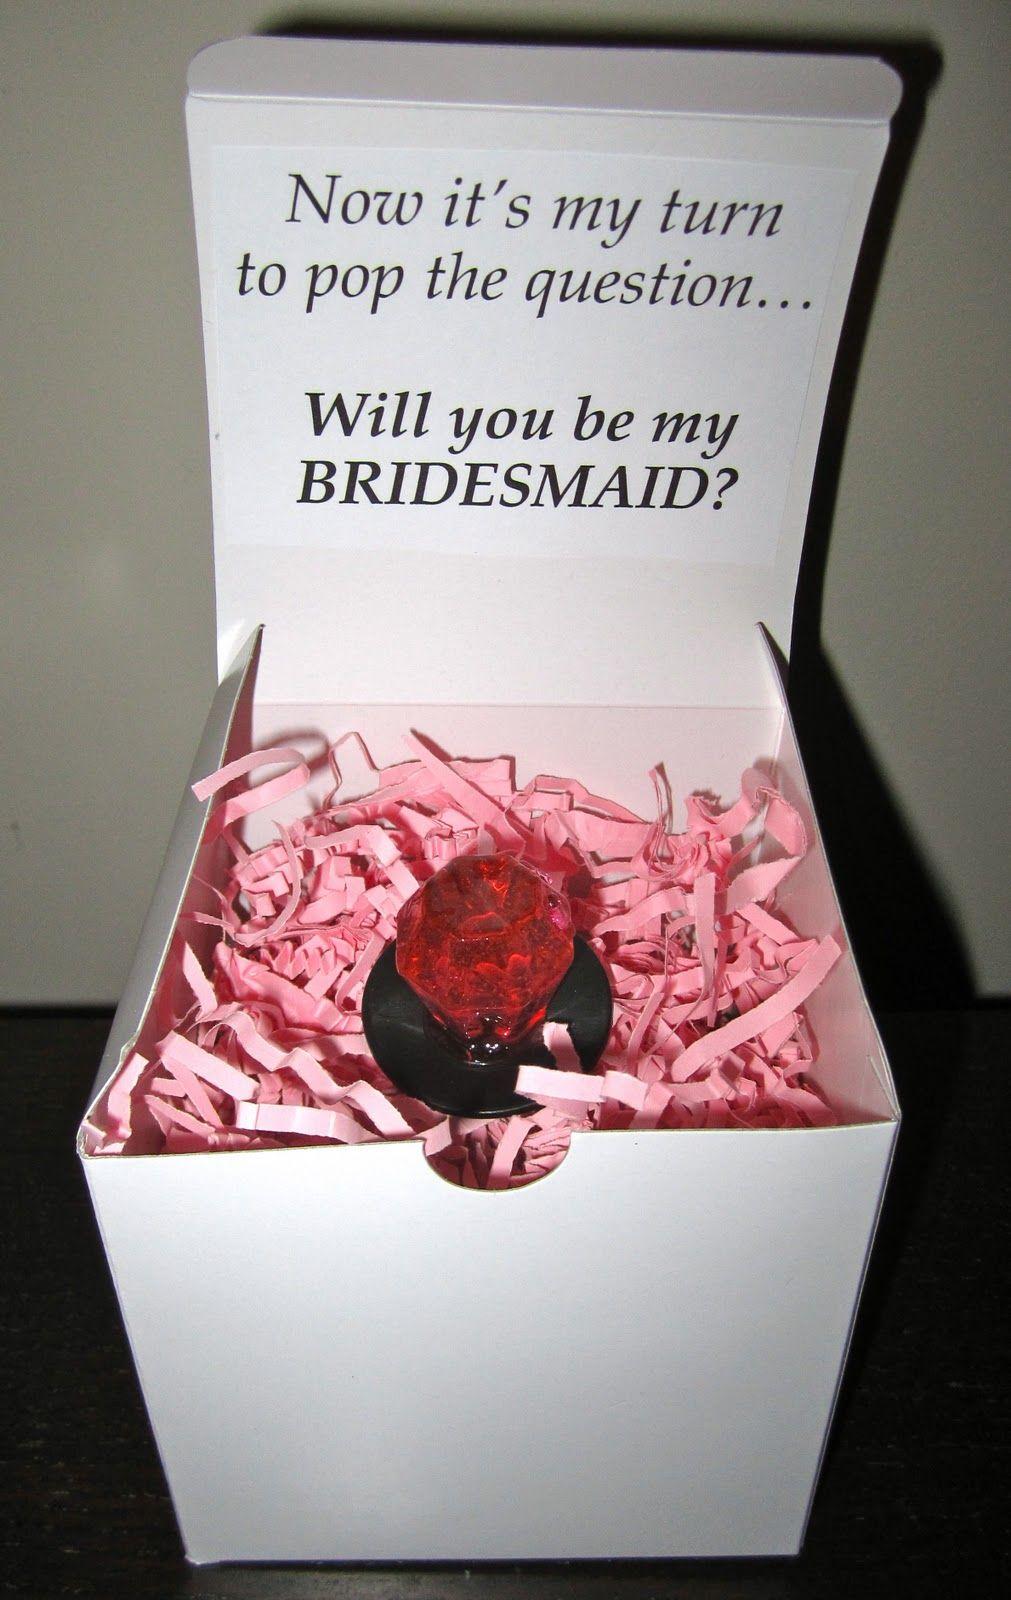 Pin by T Landrum on Way too Cute... | Pinterest | Wedding, Weddings ...